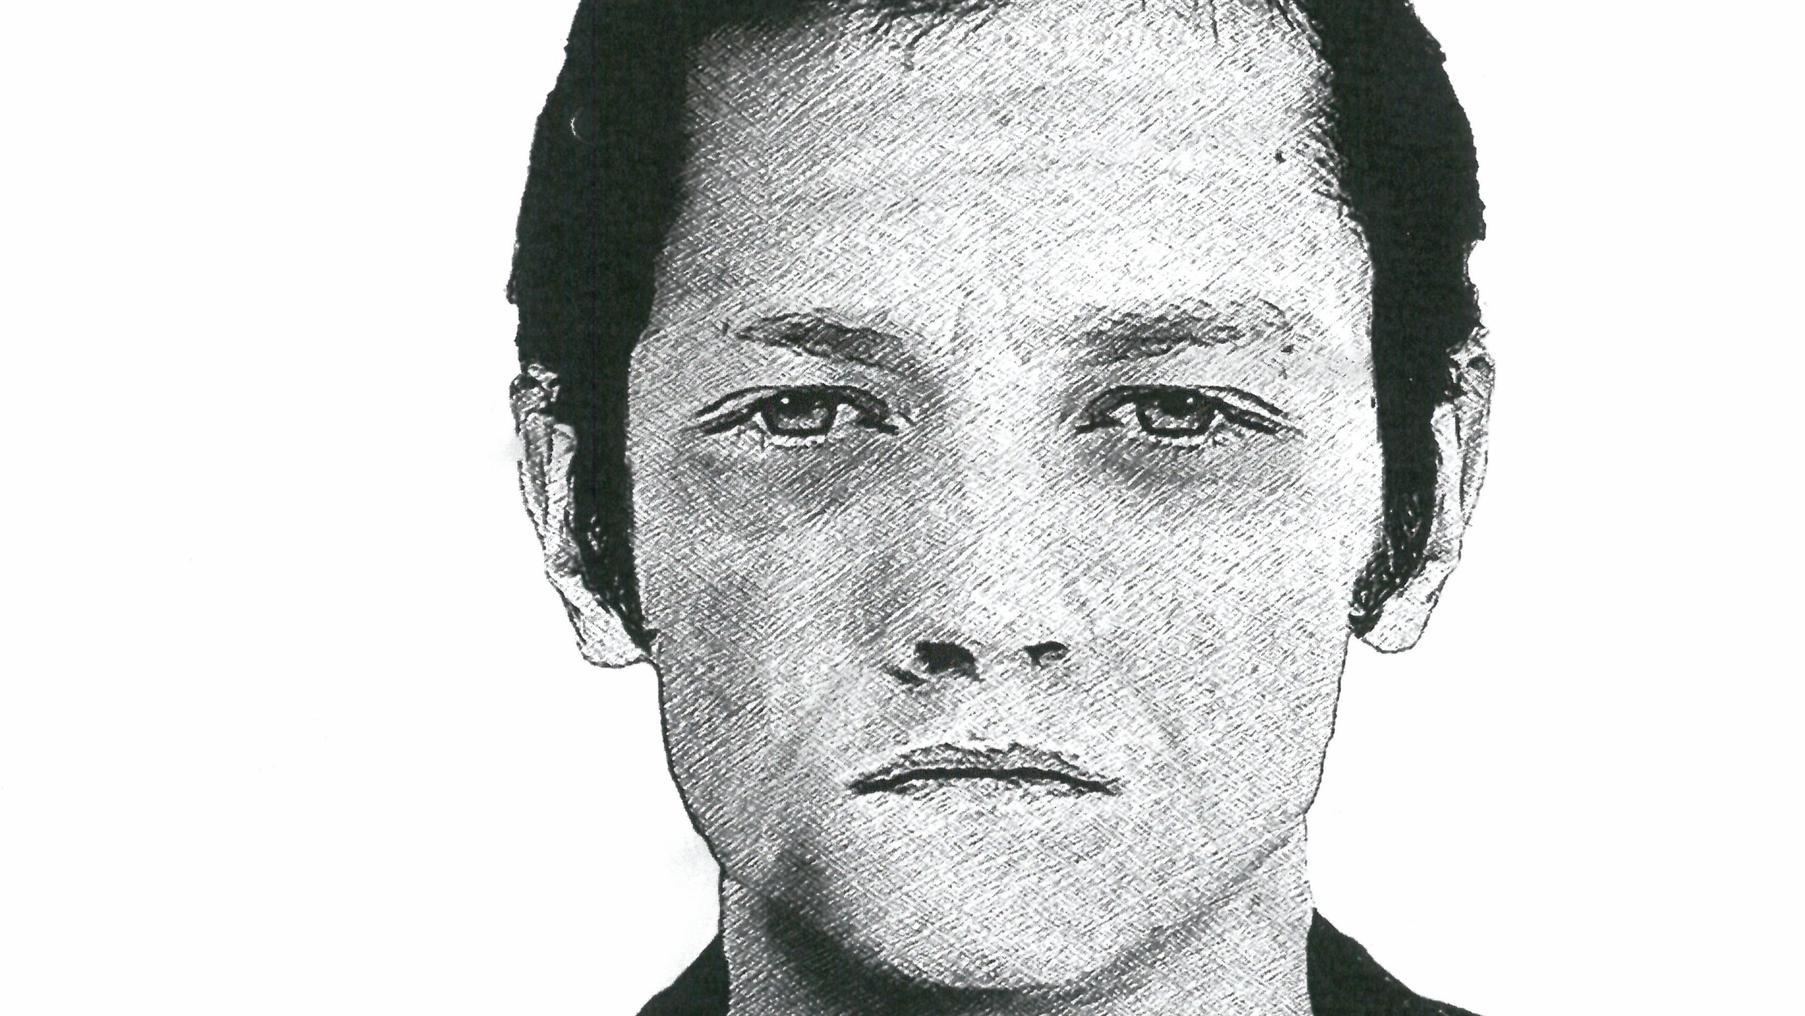 Zwei Jungen 1981 ermordet: Phantombild des Täters